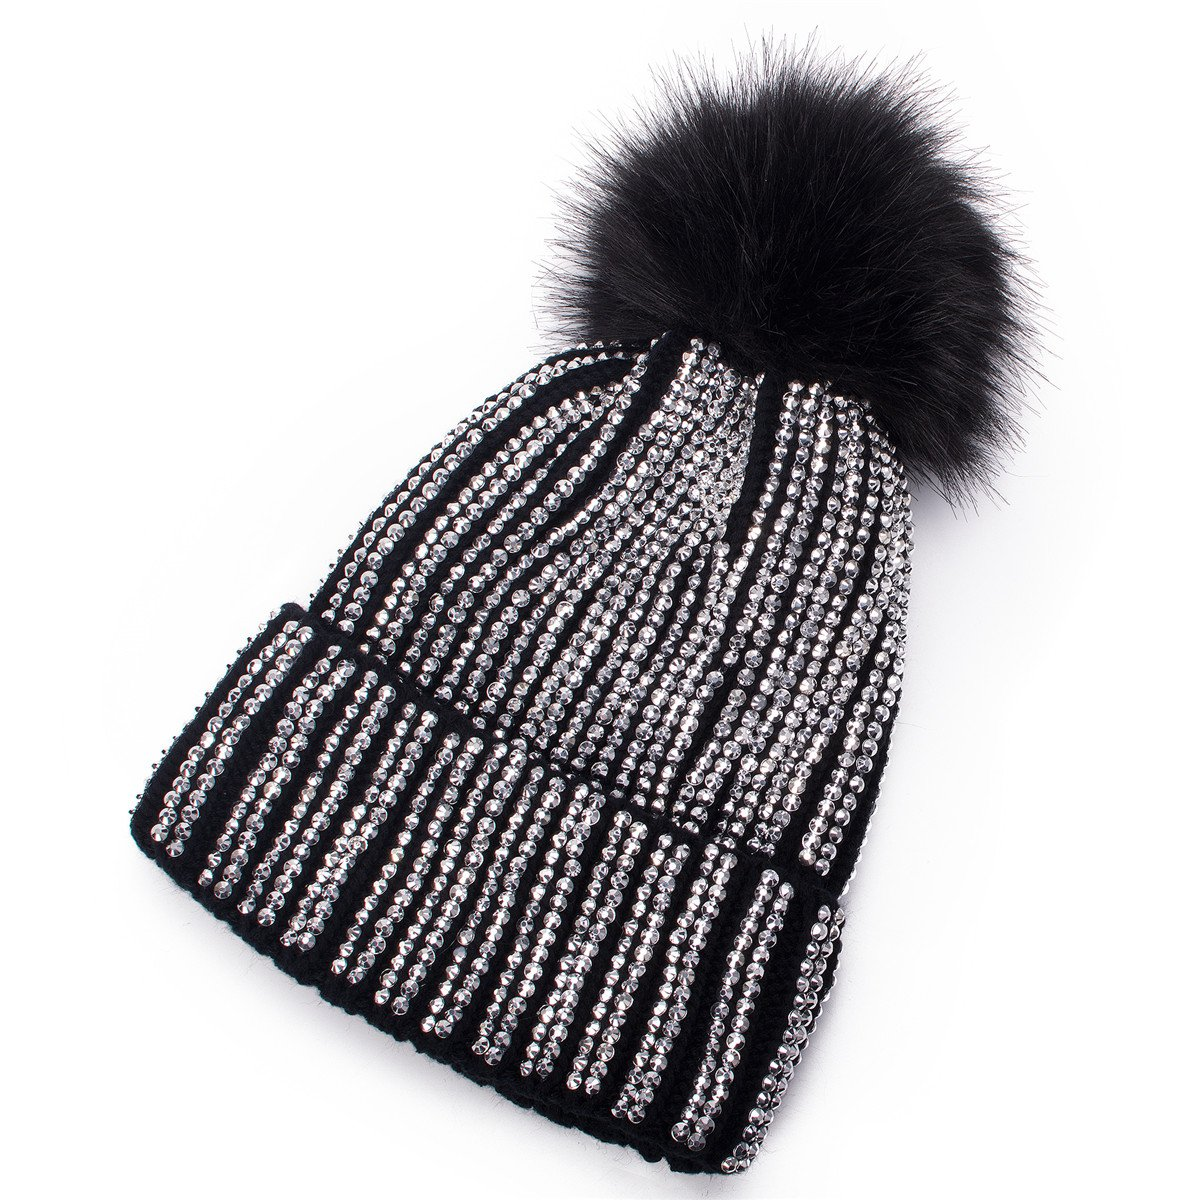 4ccc4f78734 Lawliet Womens Faux Fur Pom Pom Beanie Ski Hat Cap Slouchy Knit Warm A469  (Black) at Amazon Women s Clothing store